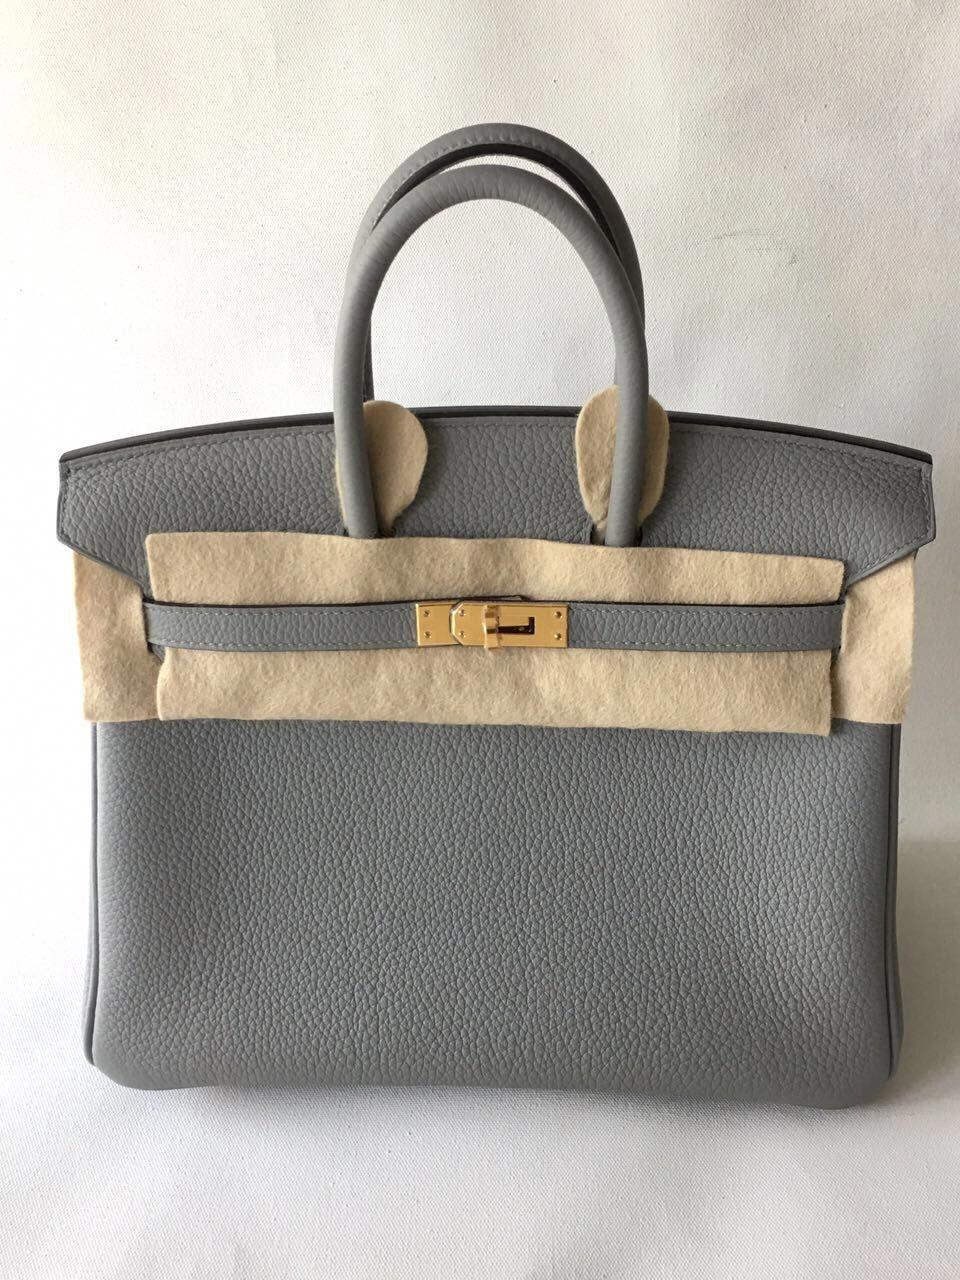 a050799132 Hermès Birkin 25 Gris Mouette Togo Gold Hardware GHW X Stamp 2016   thefrenchhunter  hermes  birkin  birkin25  birkinghw  grismouette   birkingrismouette ...